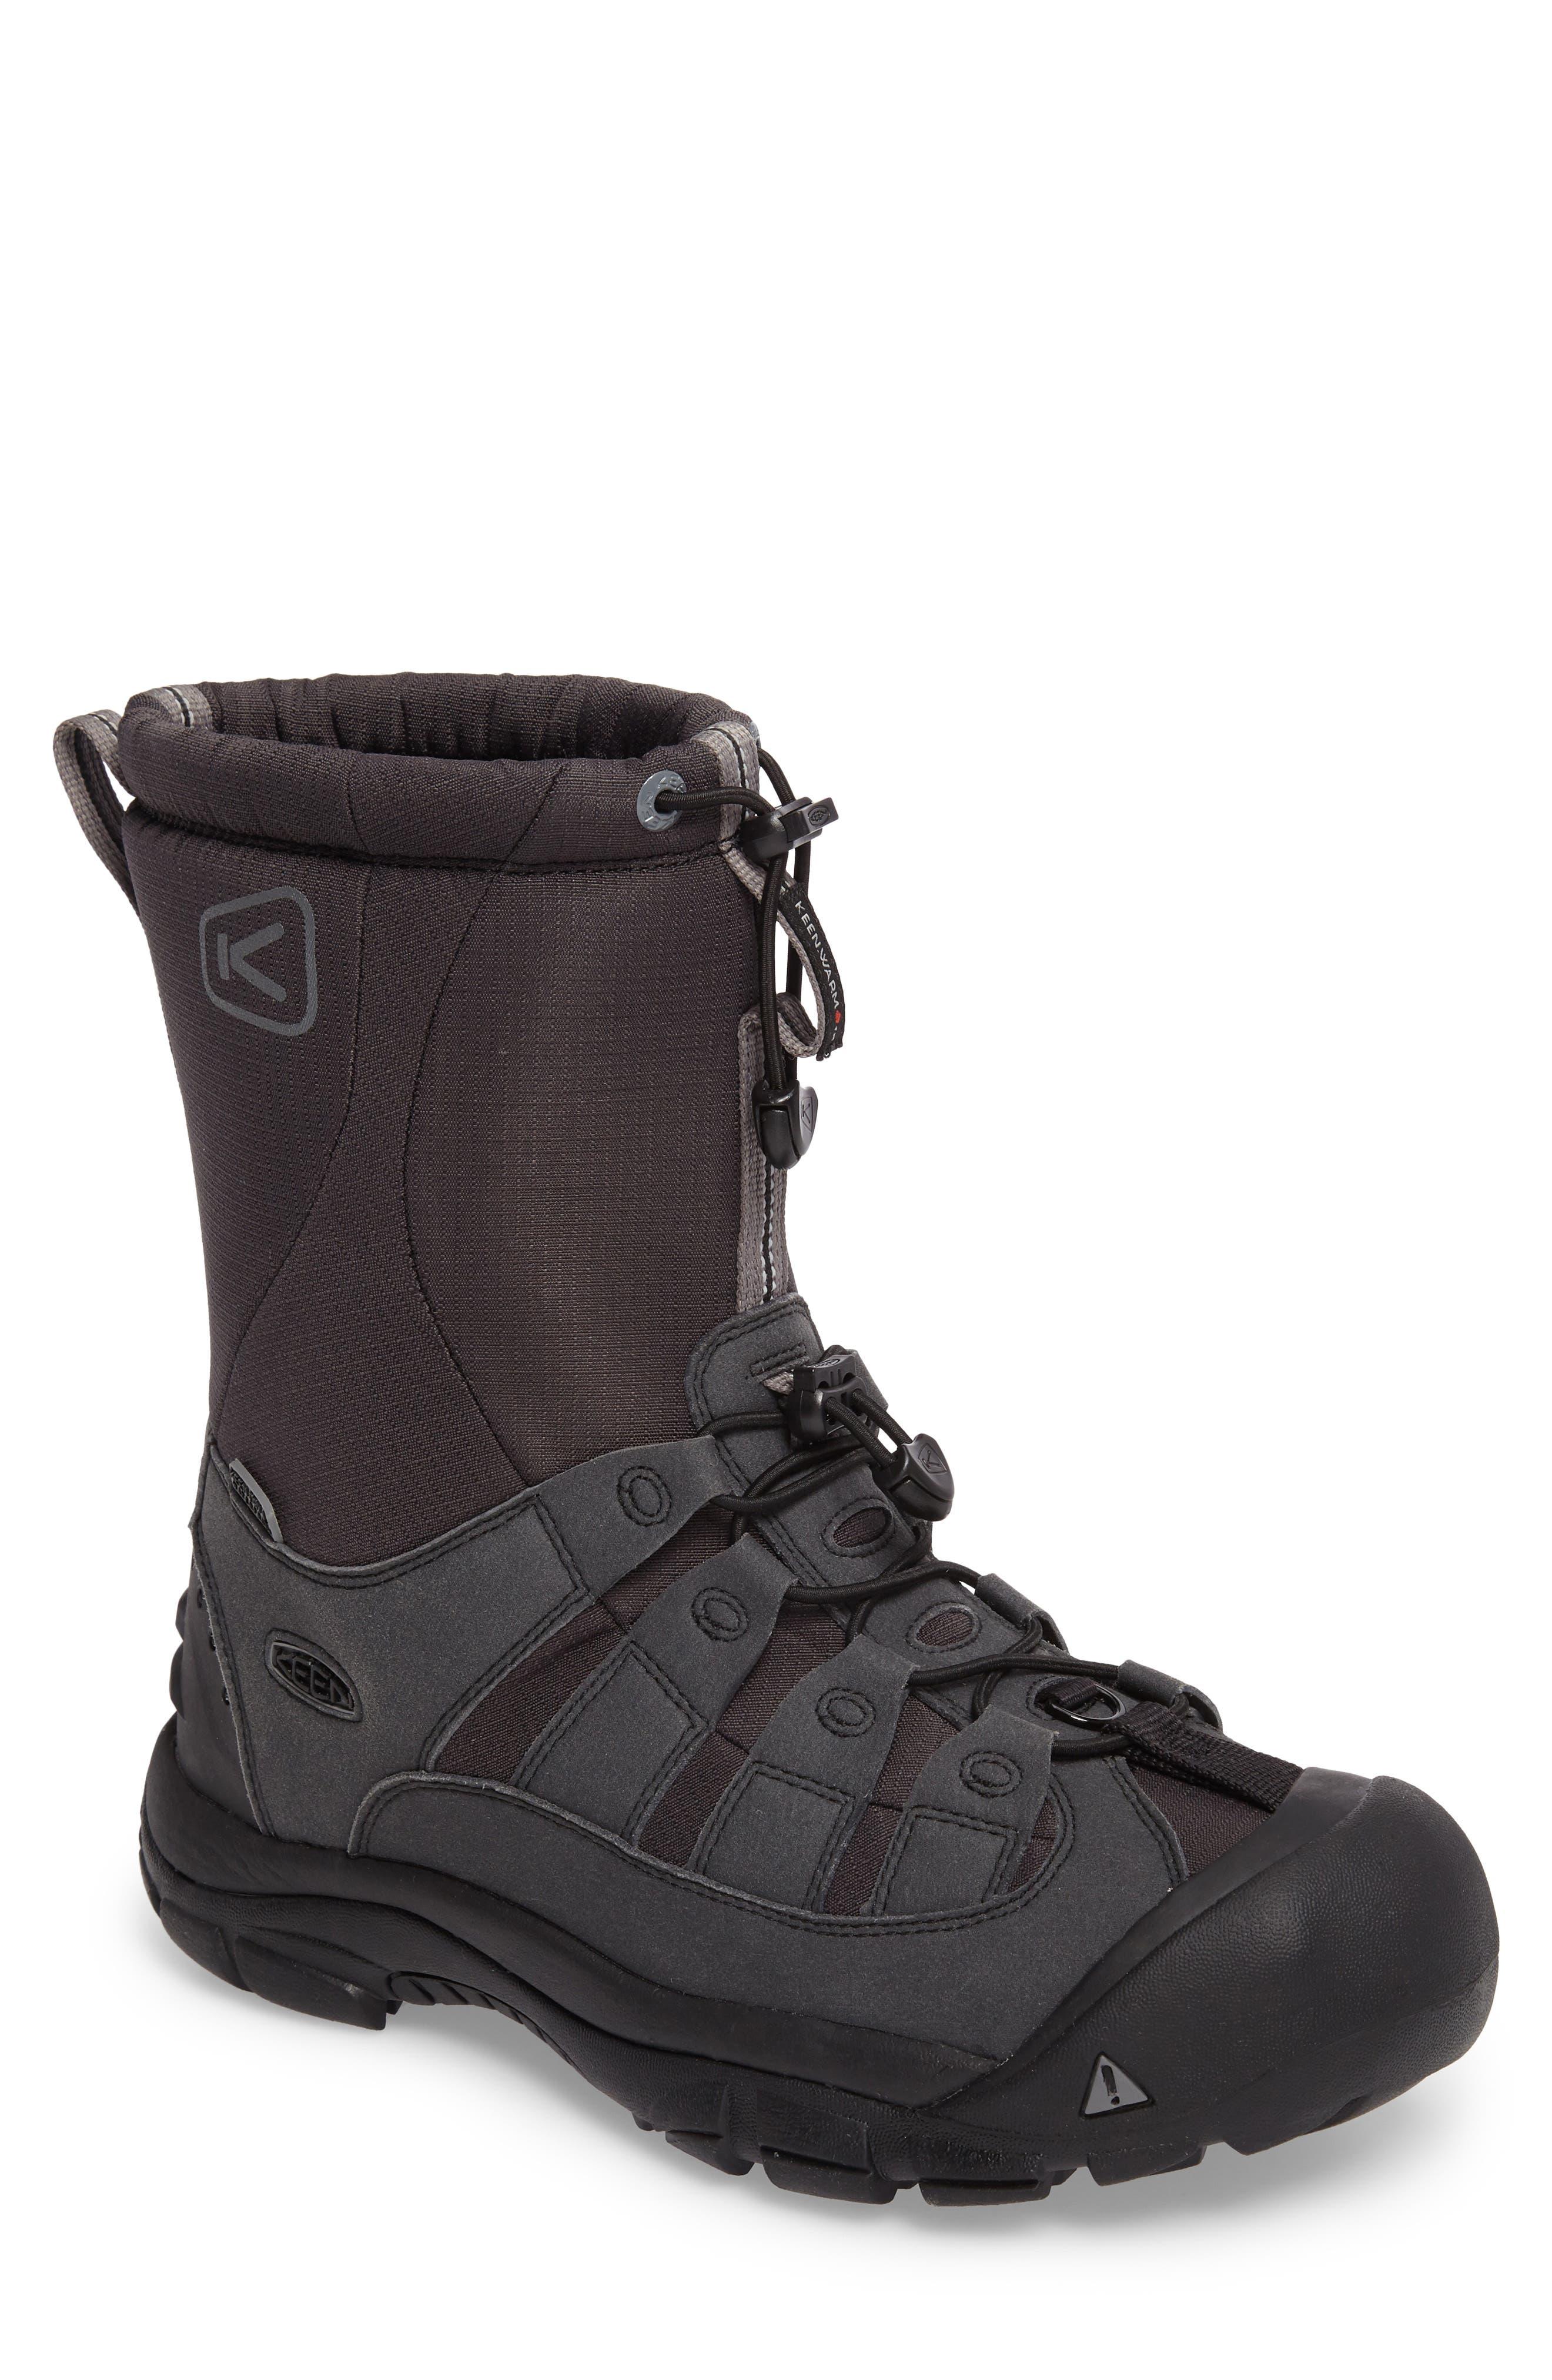 Winterport II Waterproof Insulated Snow Boot,                         Main,                         color, Black/ Frost Gray